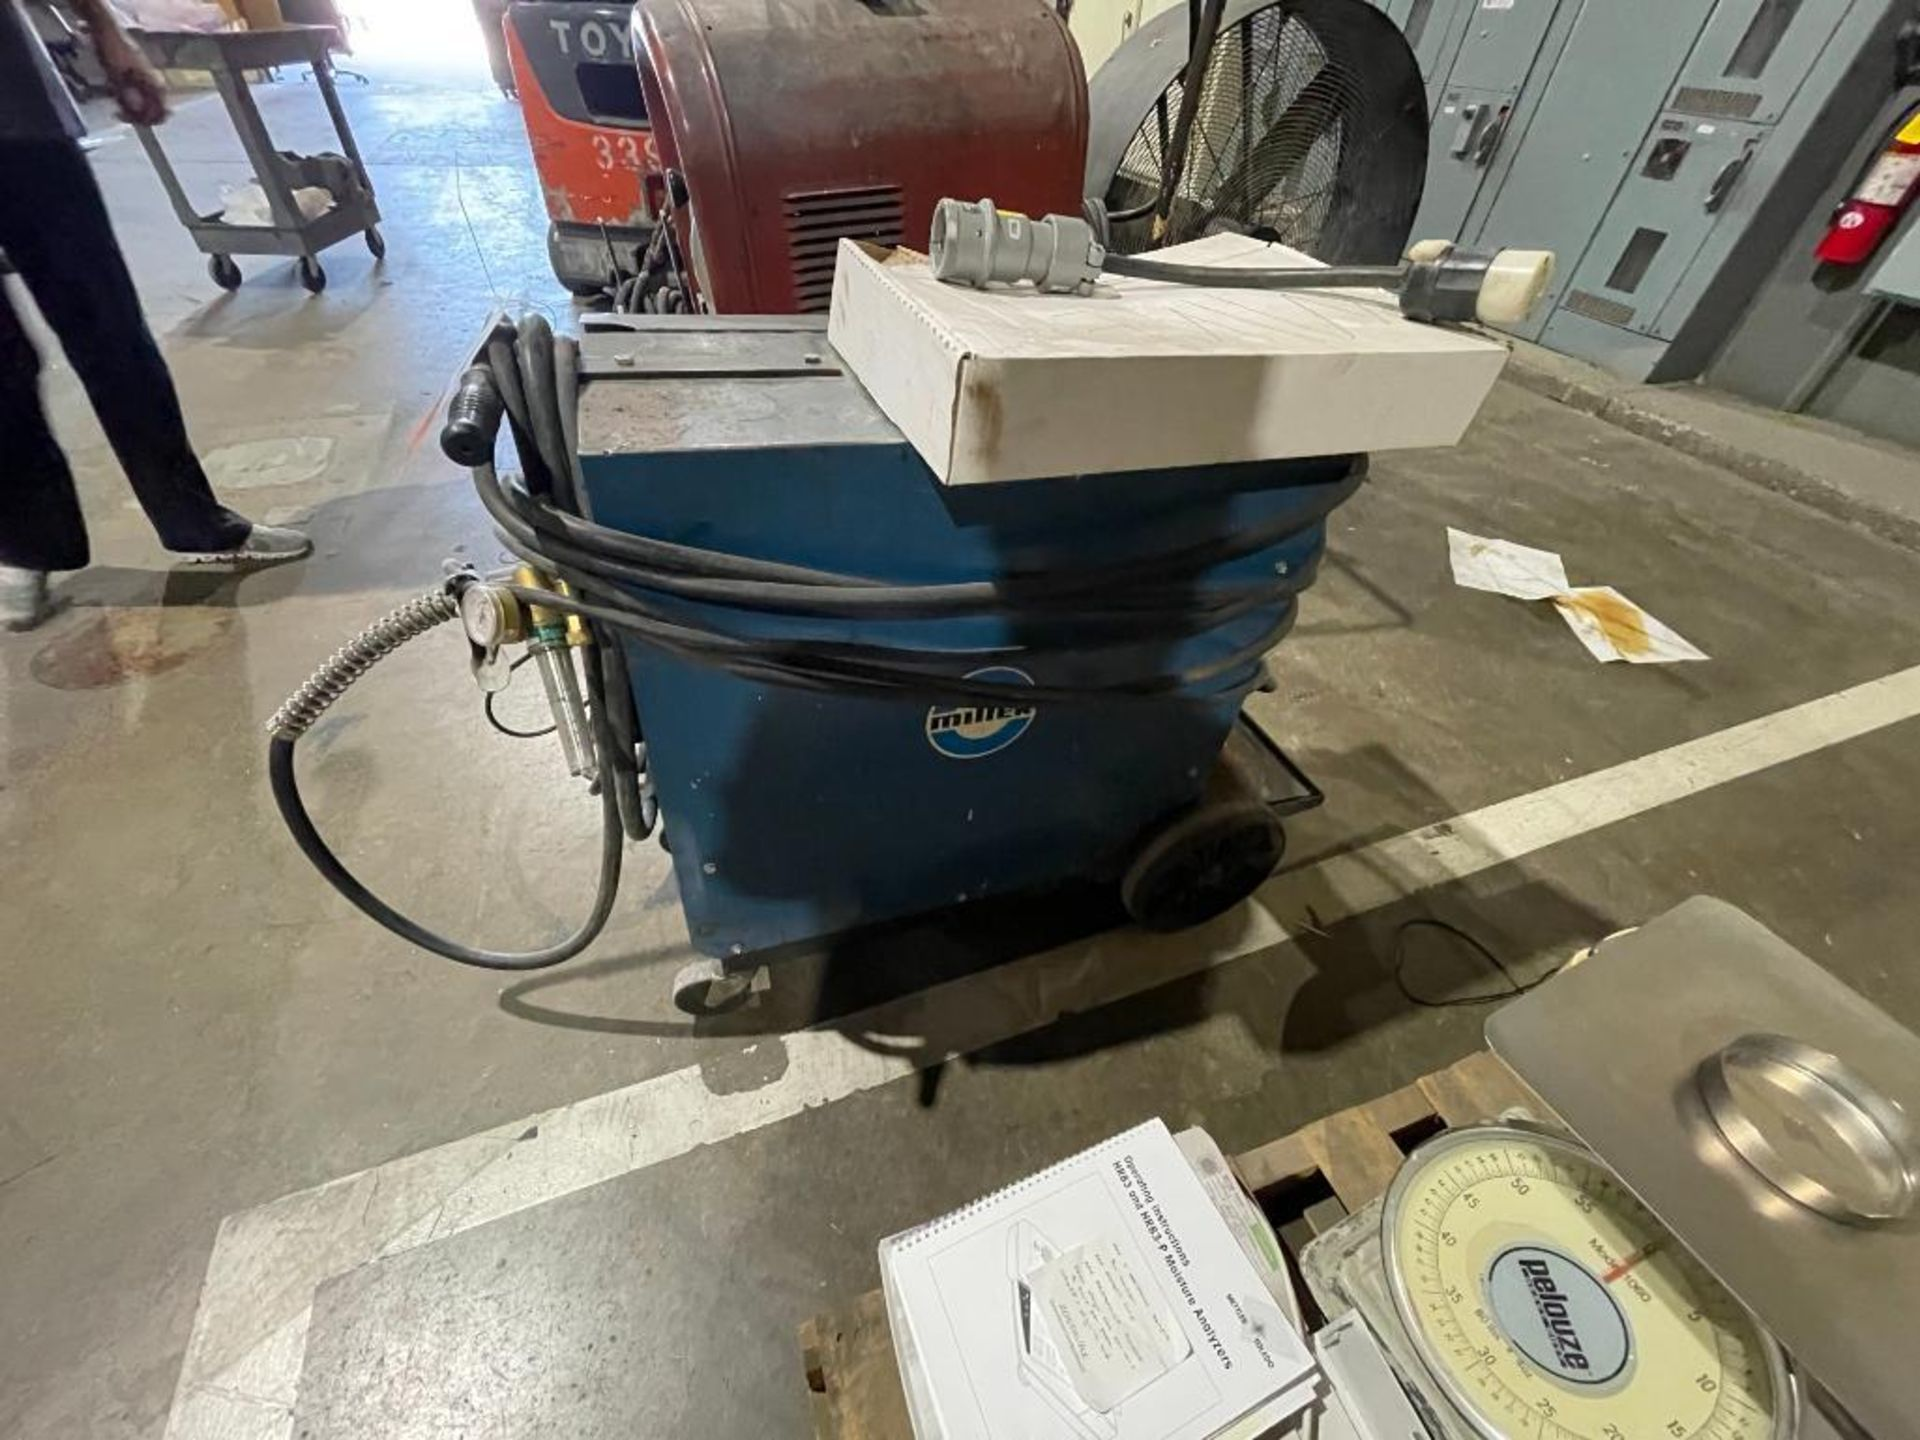 Millermatic 200 wire feed welder - Image 2 of 6